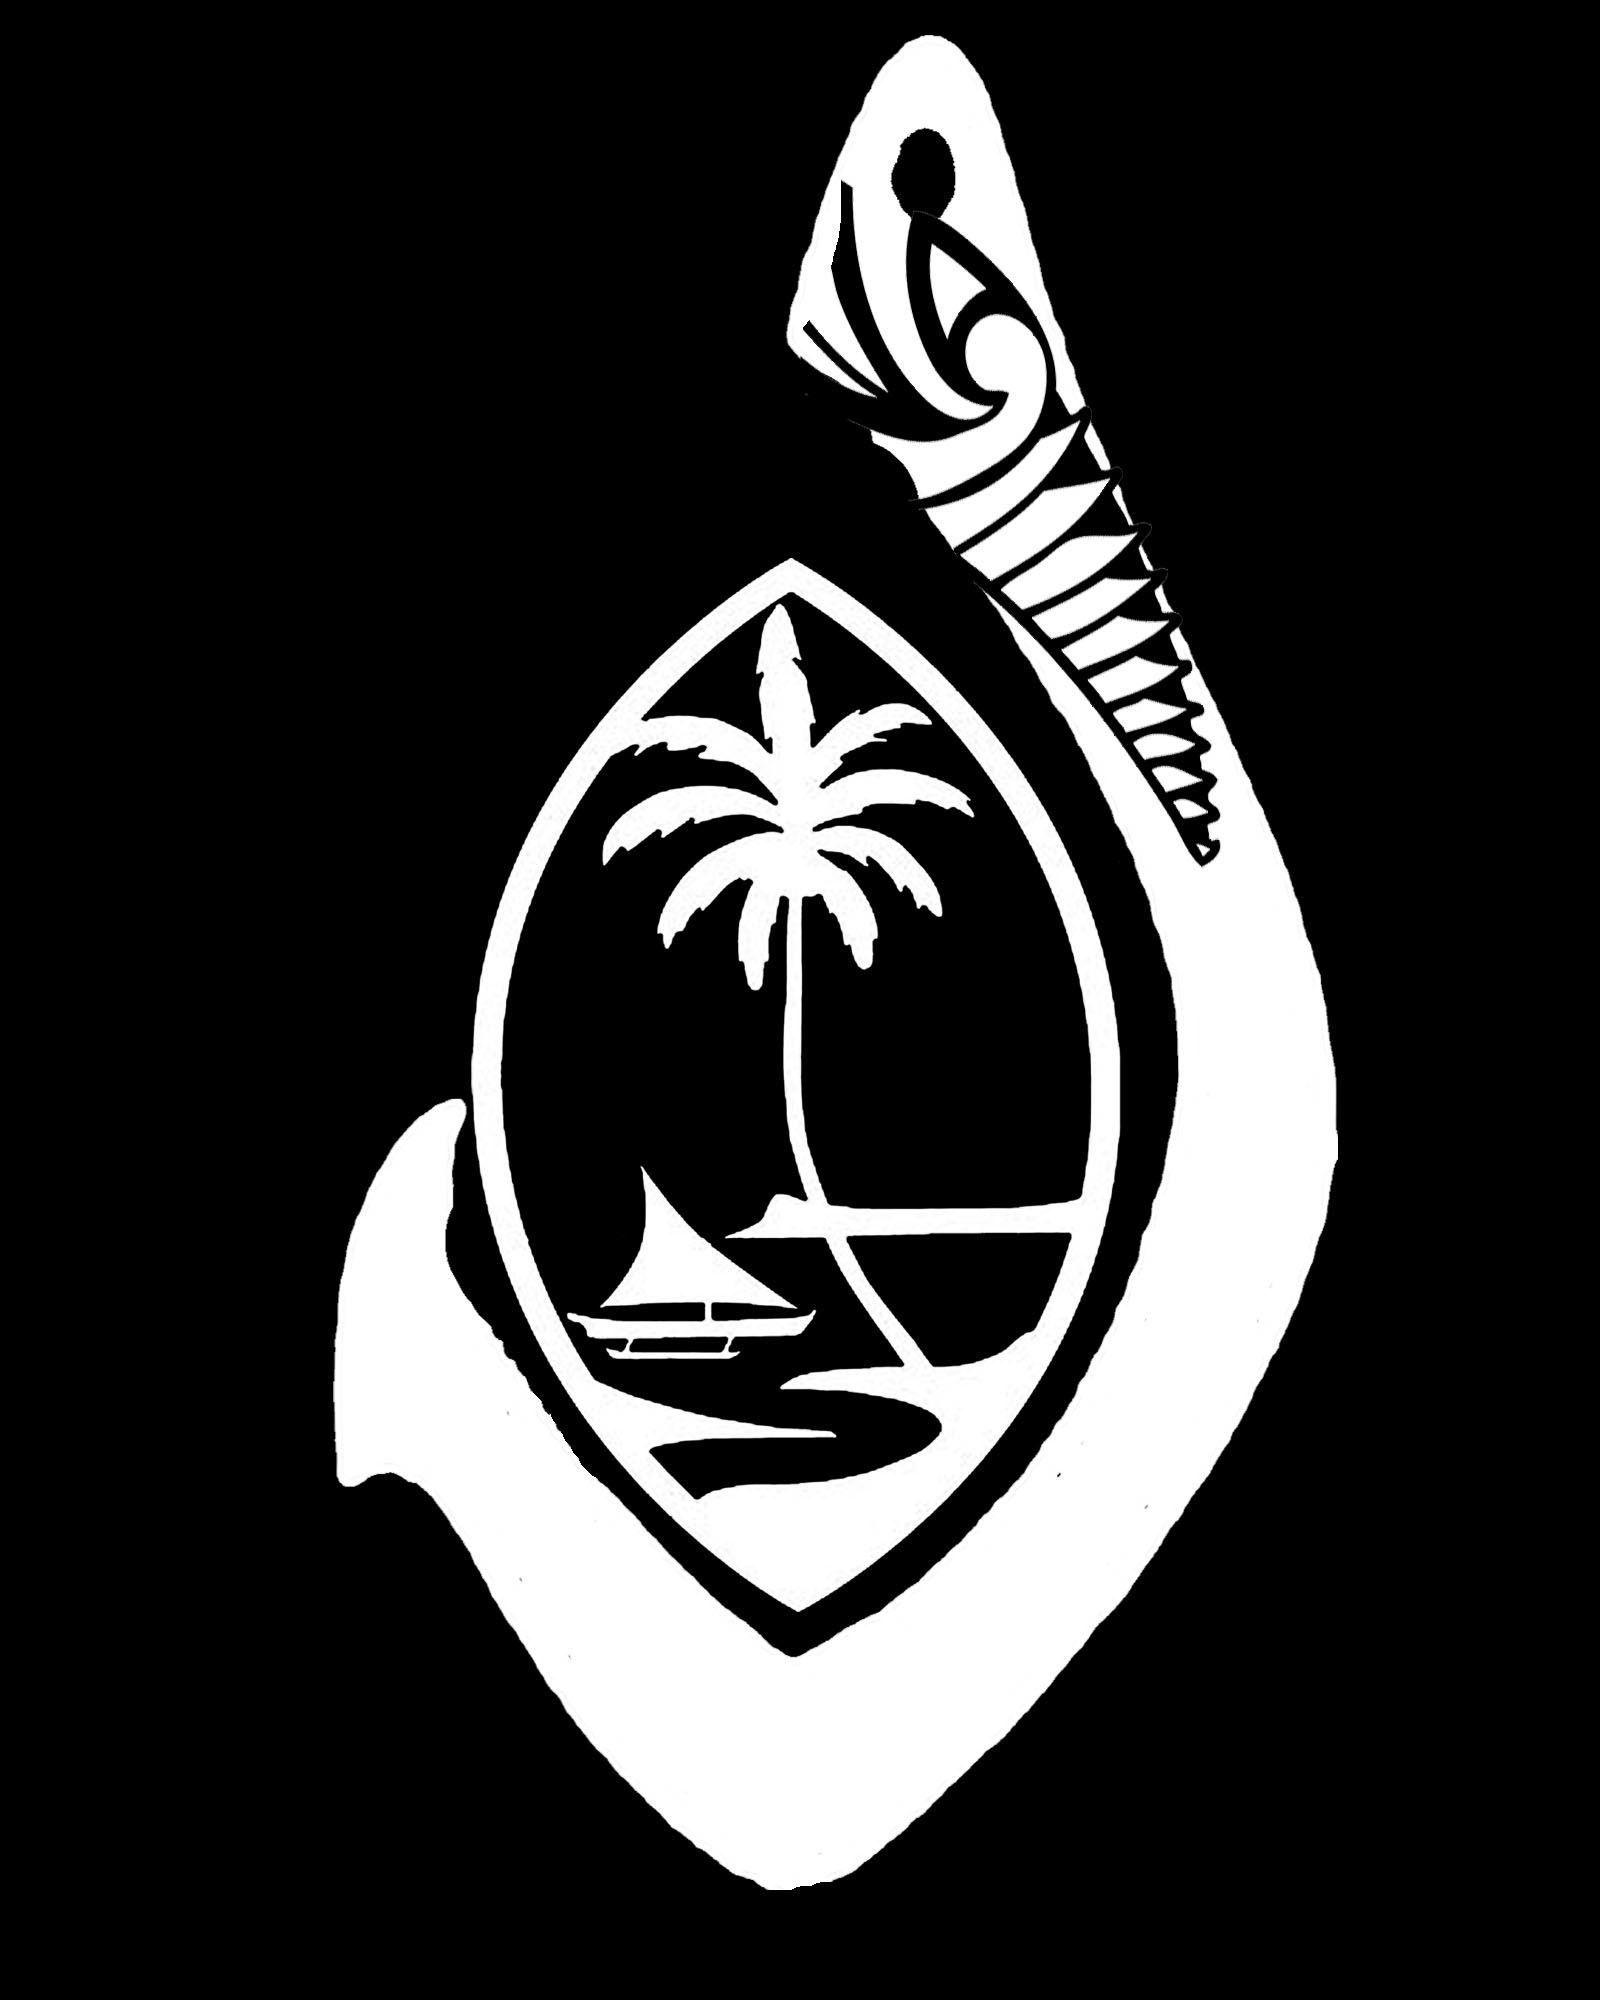 1600x2000 Guam Seal With Hook Decal Guam Decal 1 Guam